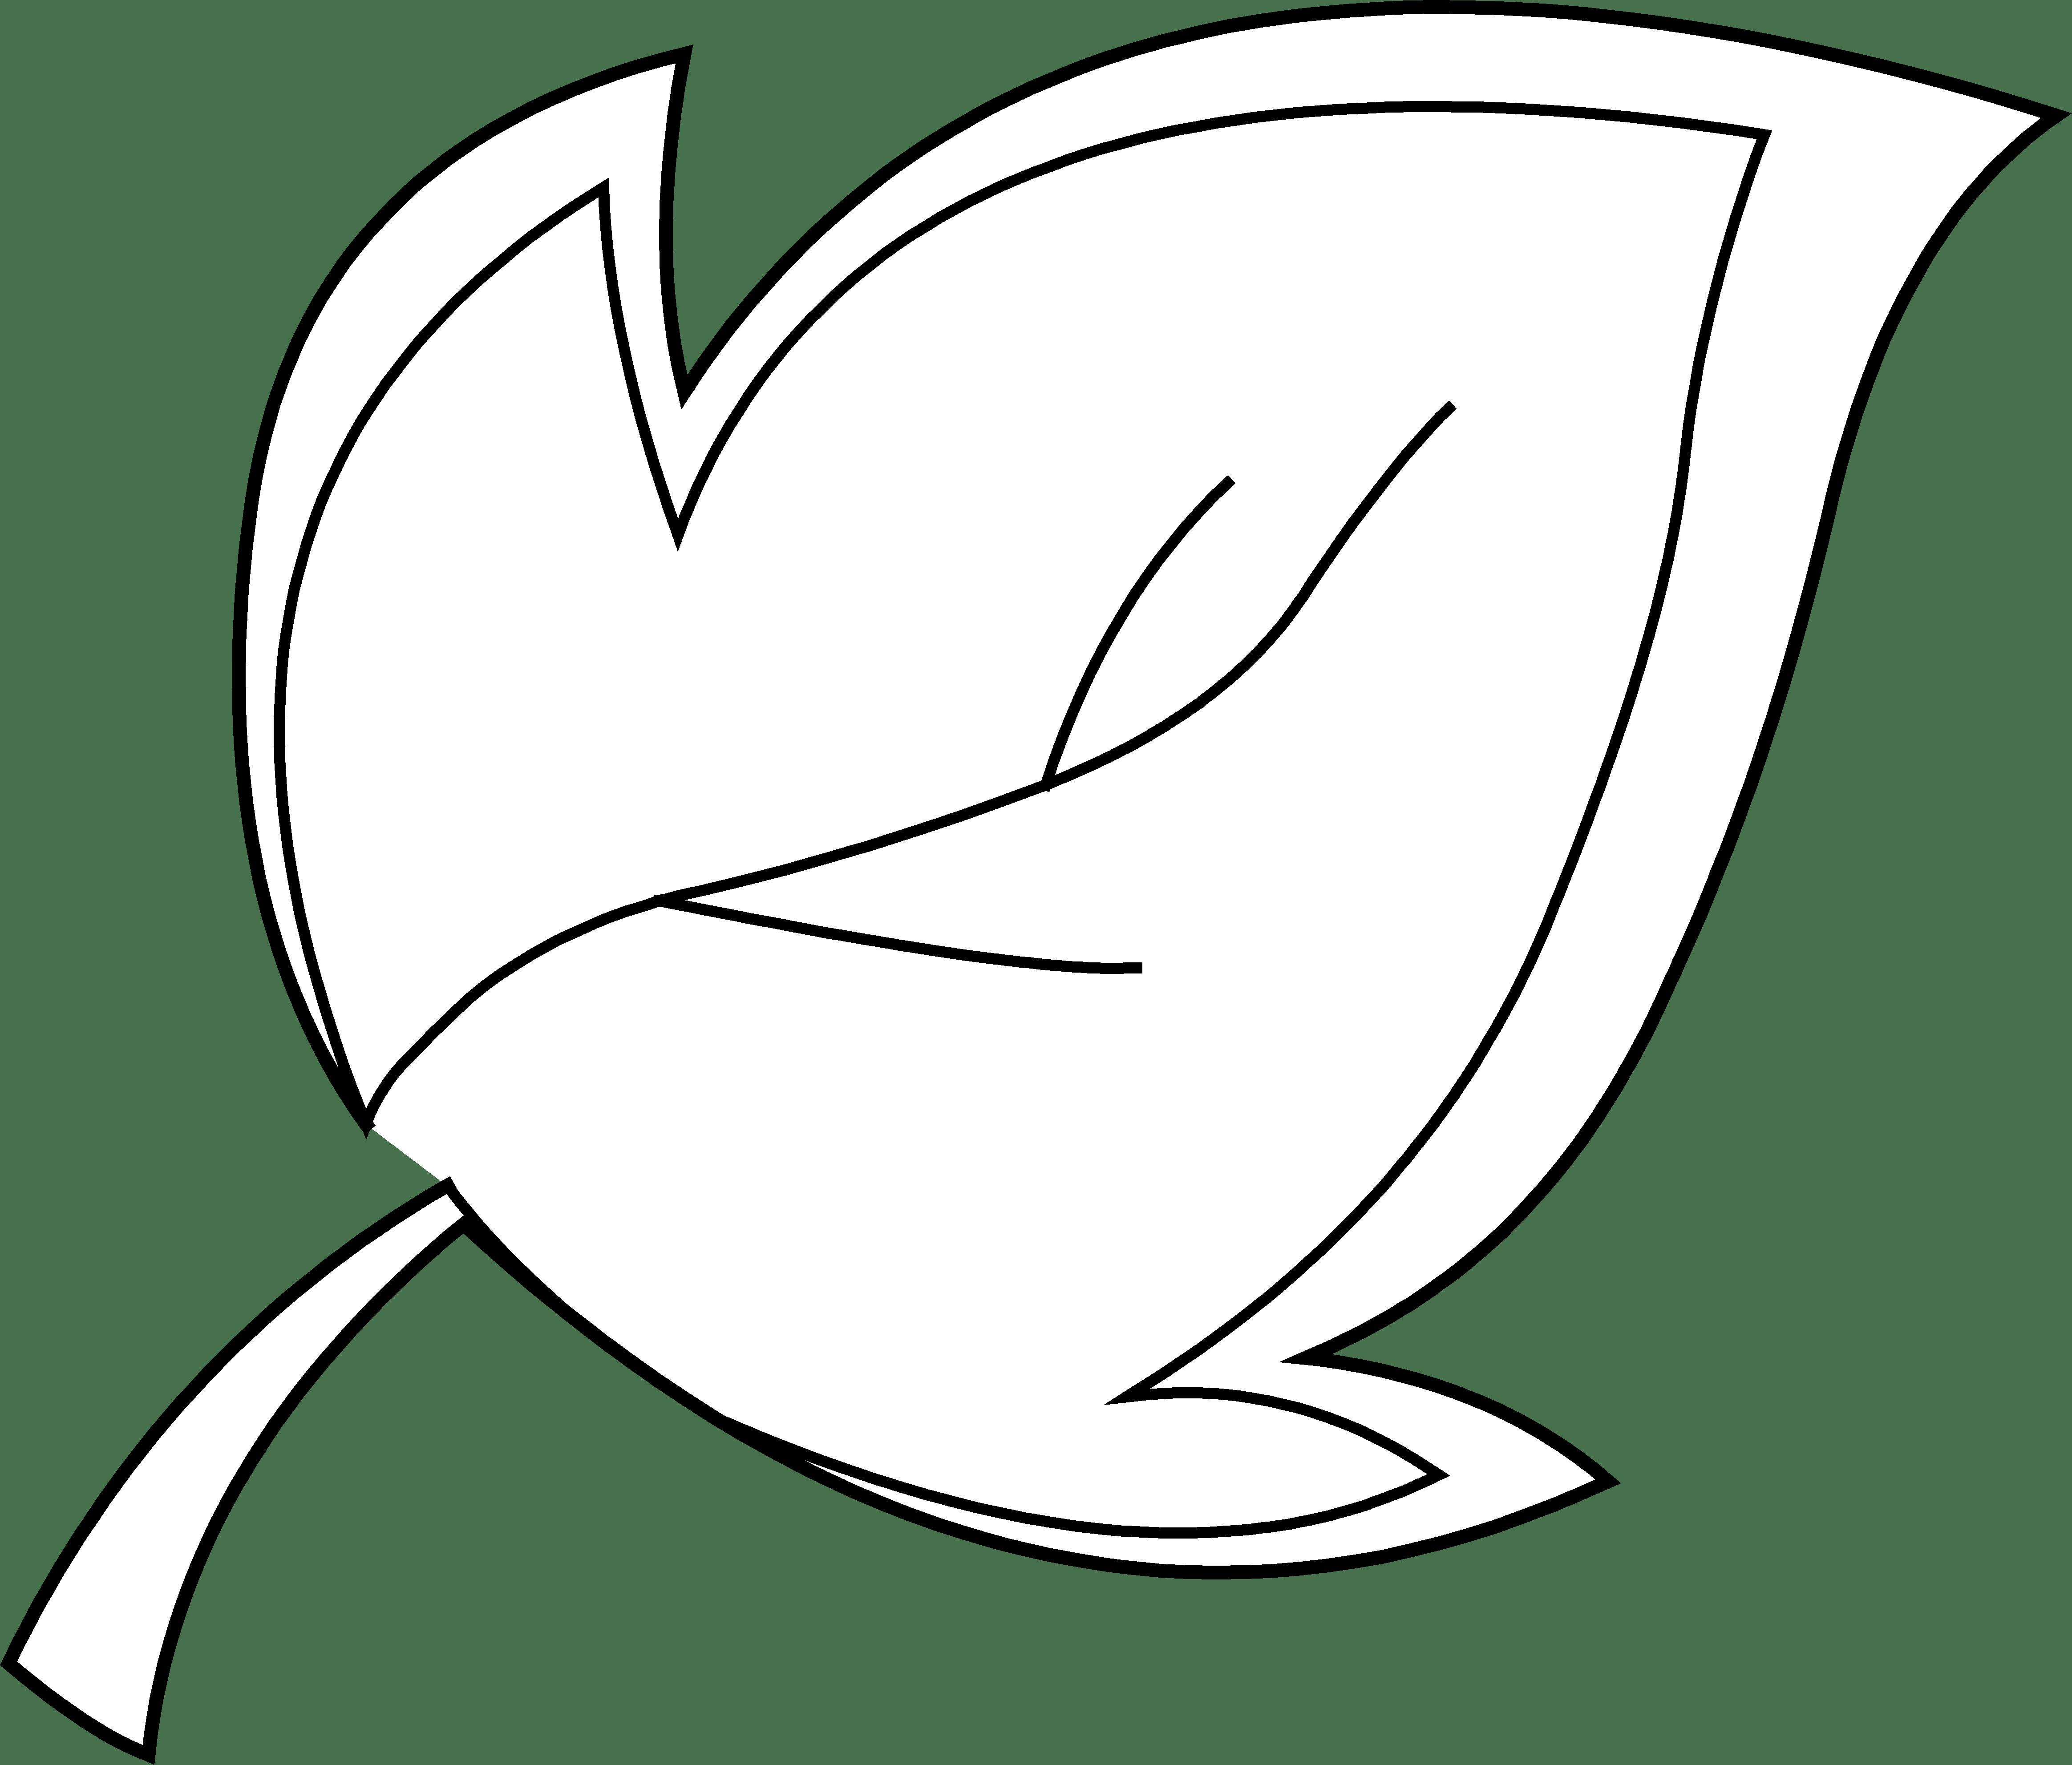 Free Leaf Line Art Download Free Clip Art Free Clip Art